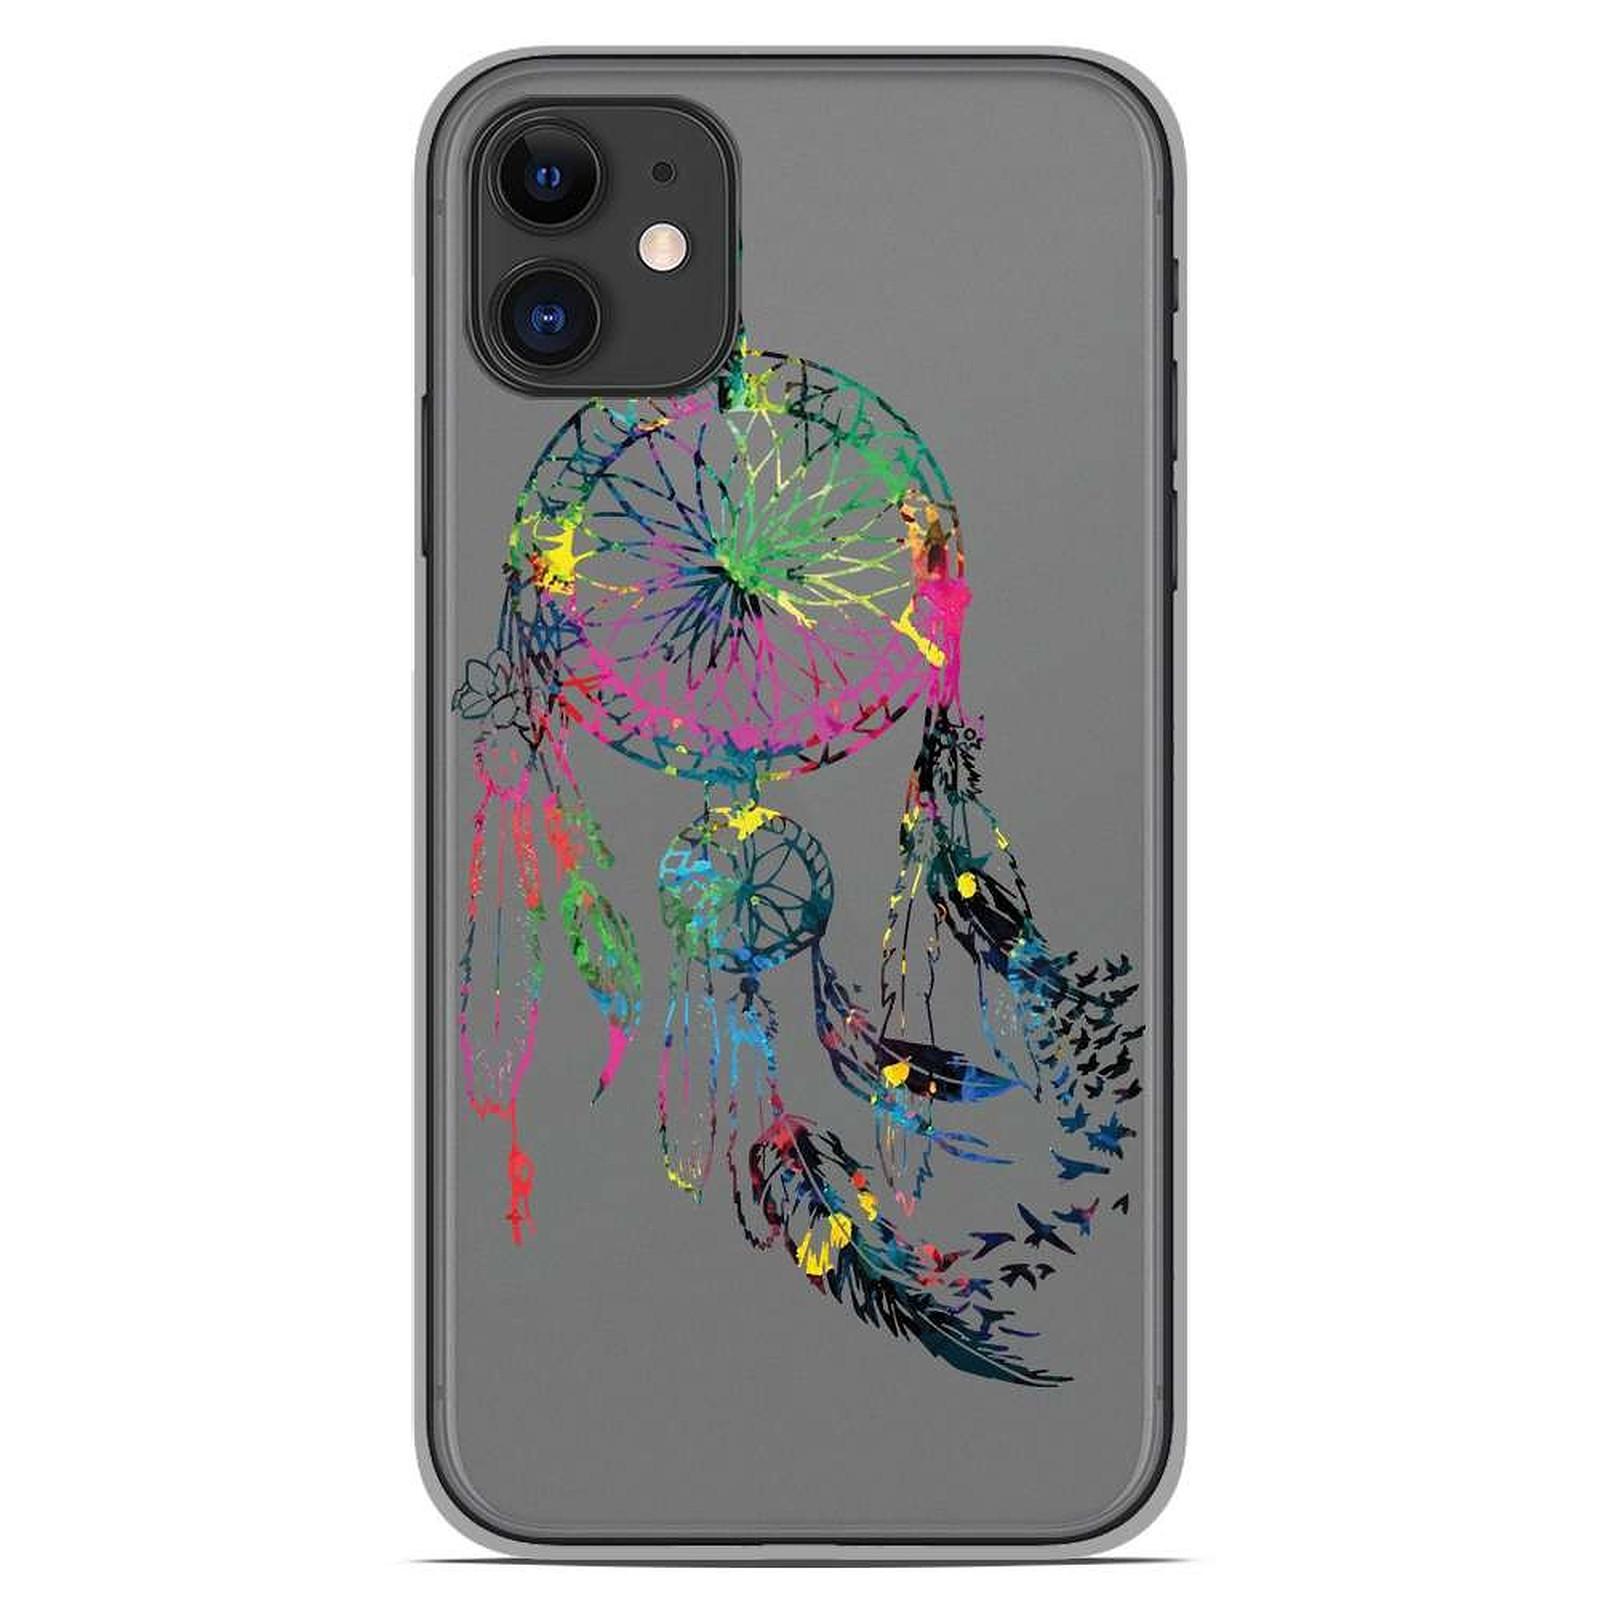 1001 Coques Coque silicone gel Apple iPhone 11 motif Dreamcatcher Gris